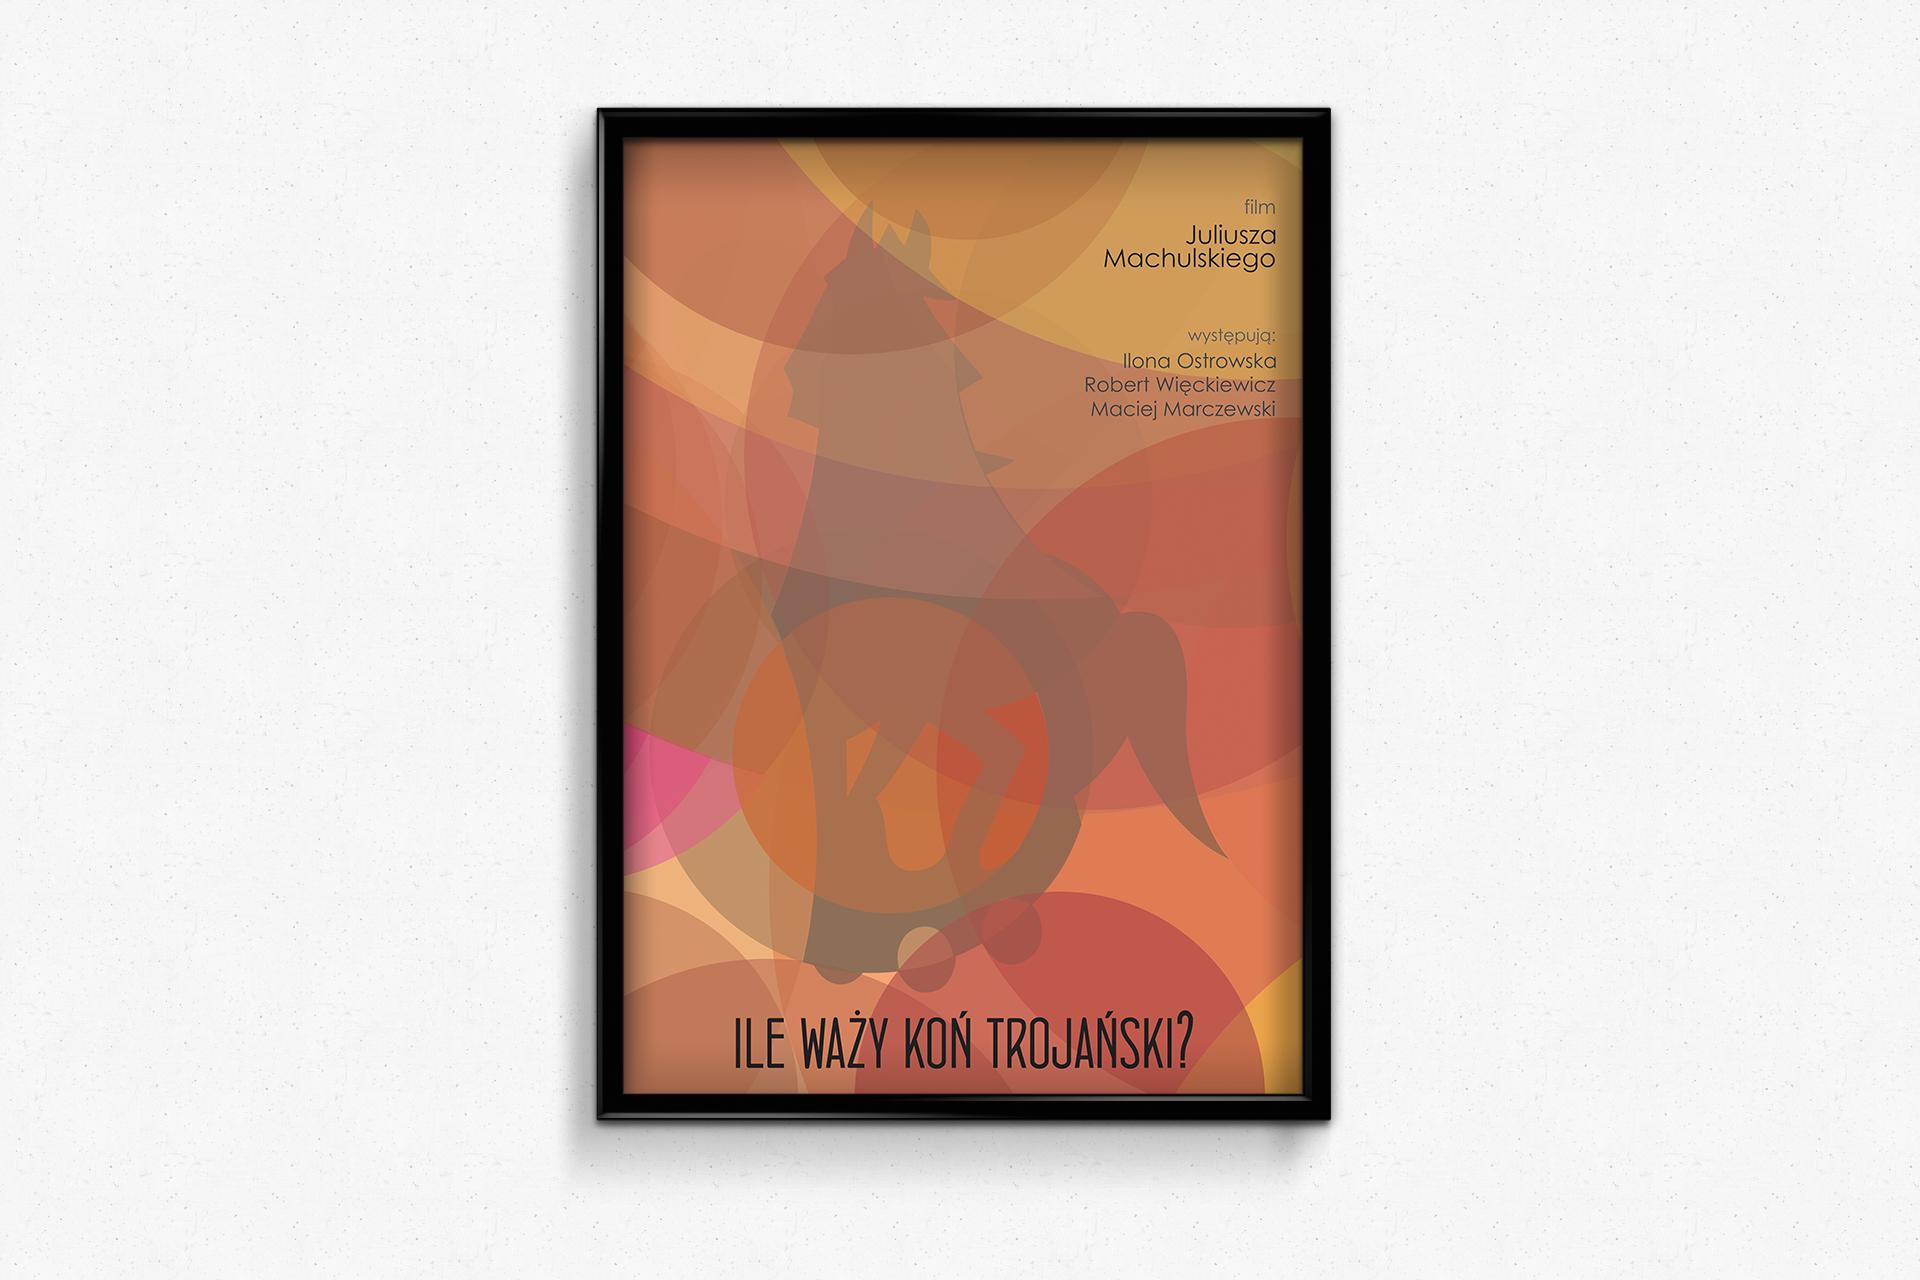 Juliusz Machulski Movie Posters Diploma On Behance